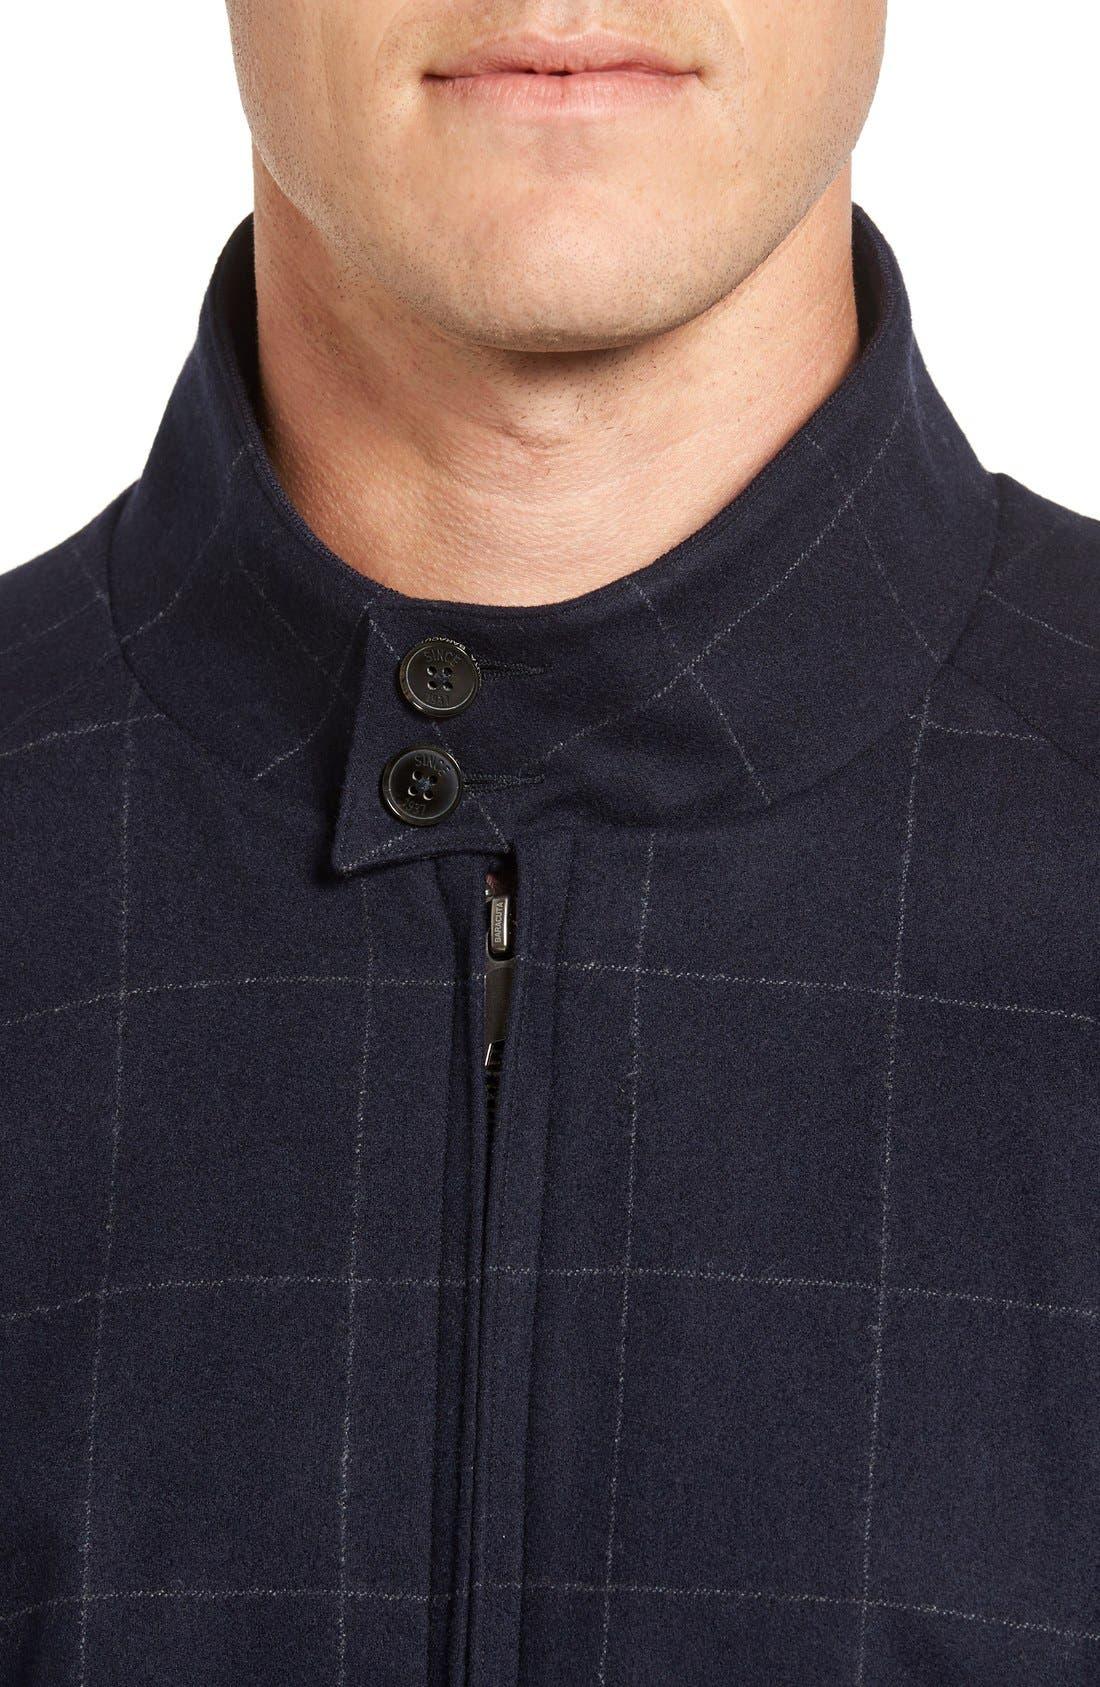 Wool G9 Harrington Jacket,                             Alternate thumbnail 5, color,                             462